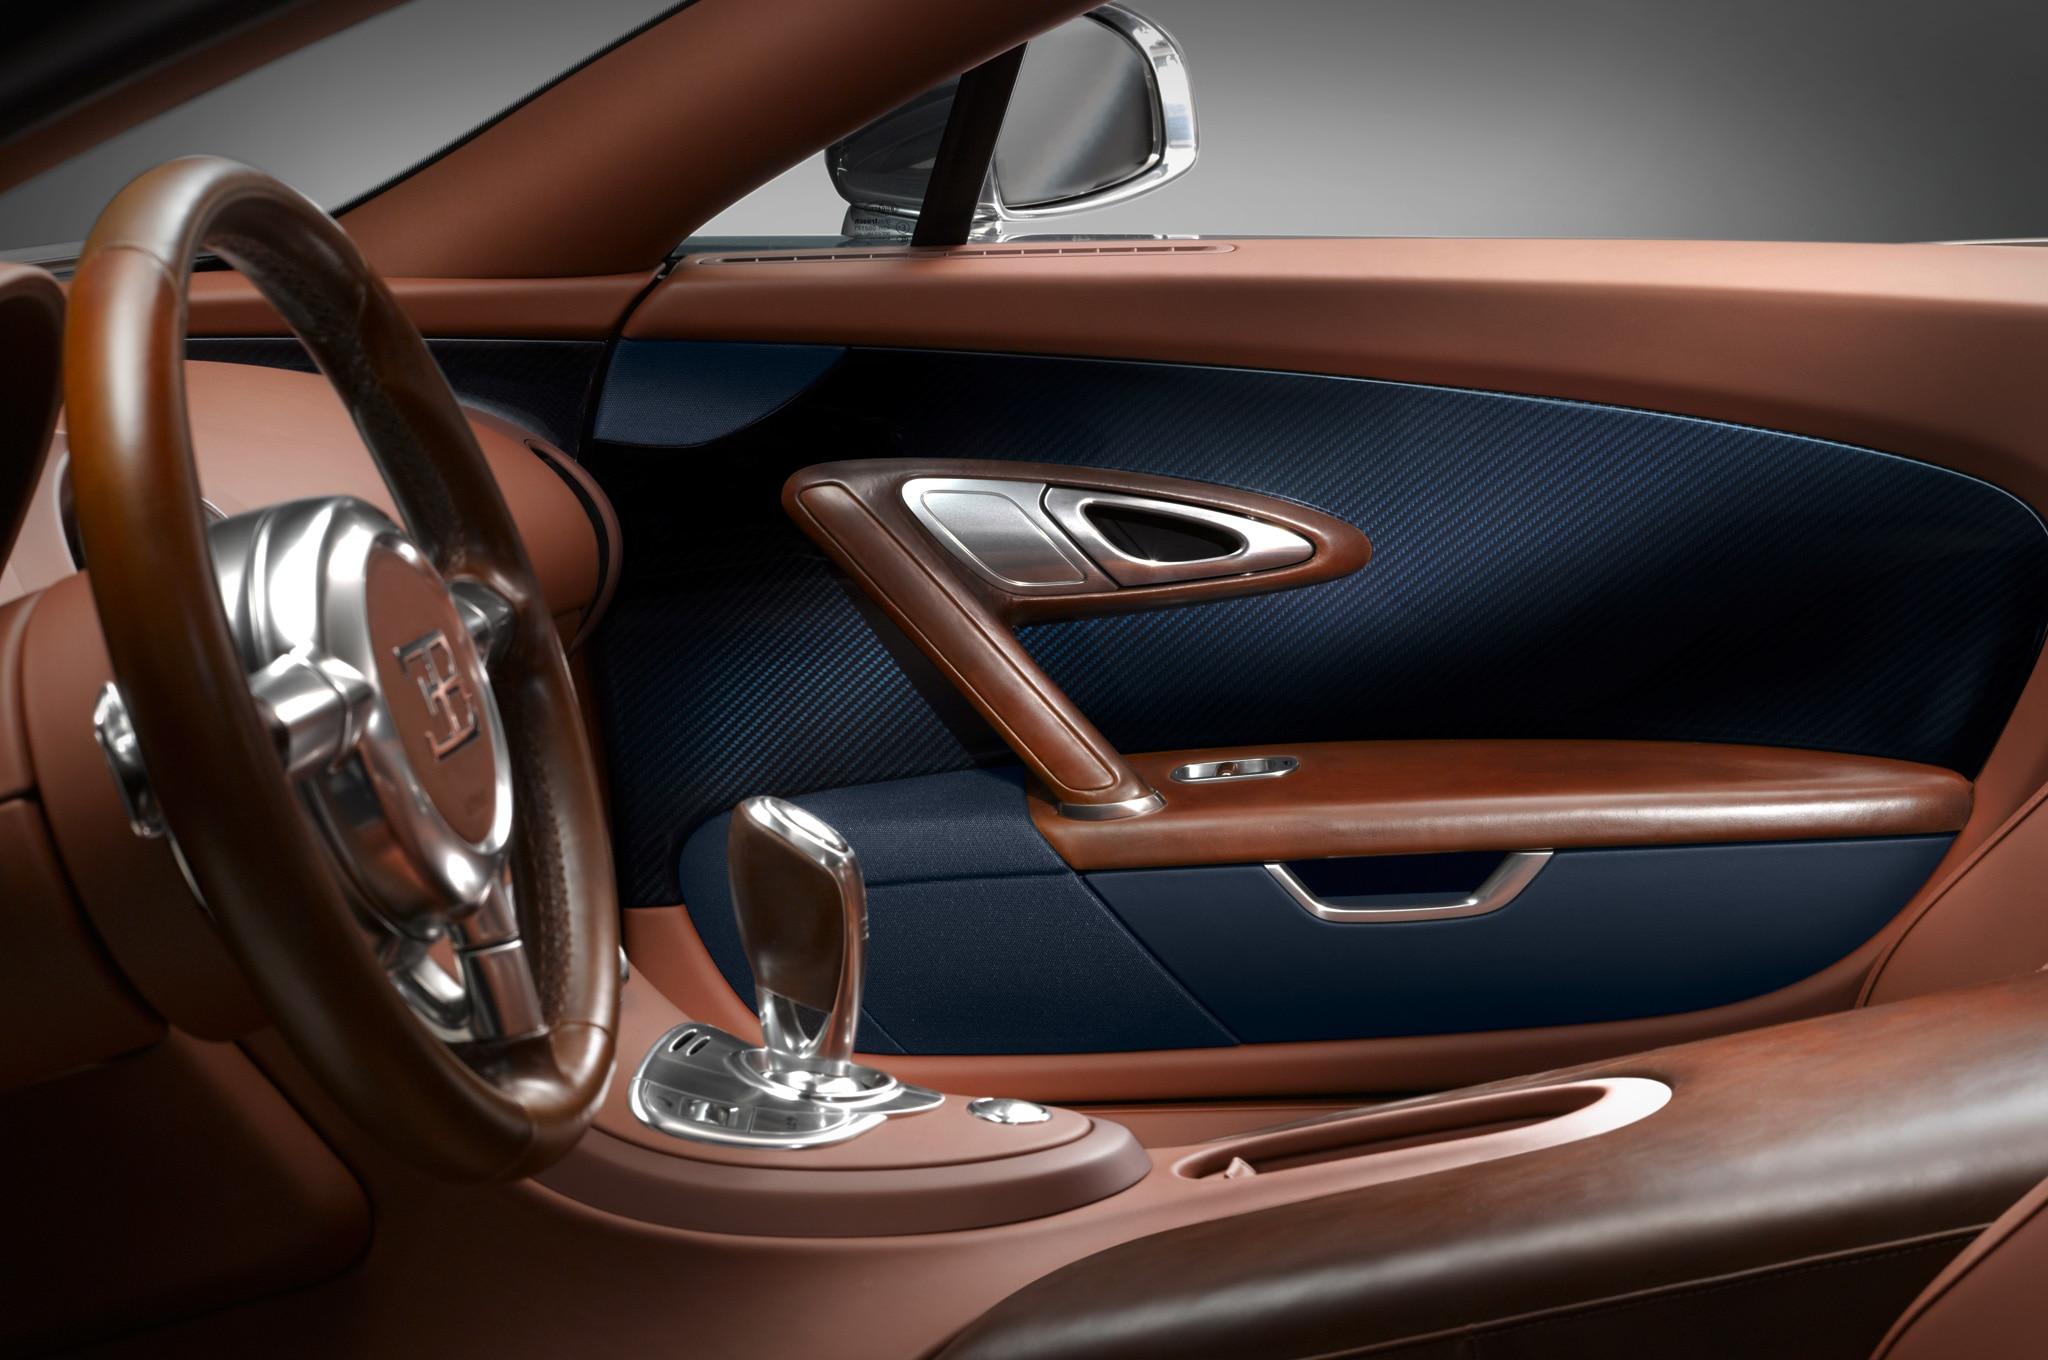 Bugatti-Veyron-Grand-Sport-Vitesse-Legends-Ettore-Bugatti-interior-door-panel Stunning Bugatti Veyron 16.4 Grand Sport Vitesse Interior Cars Trend